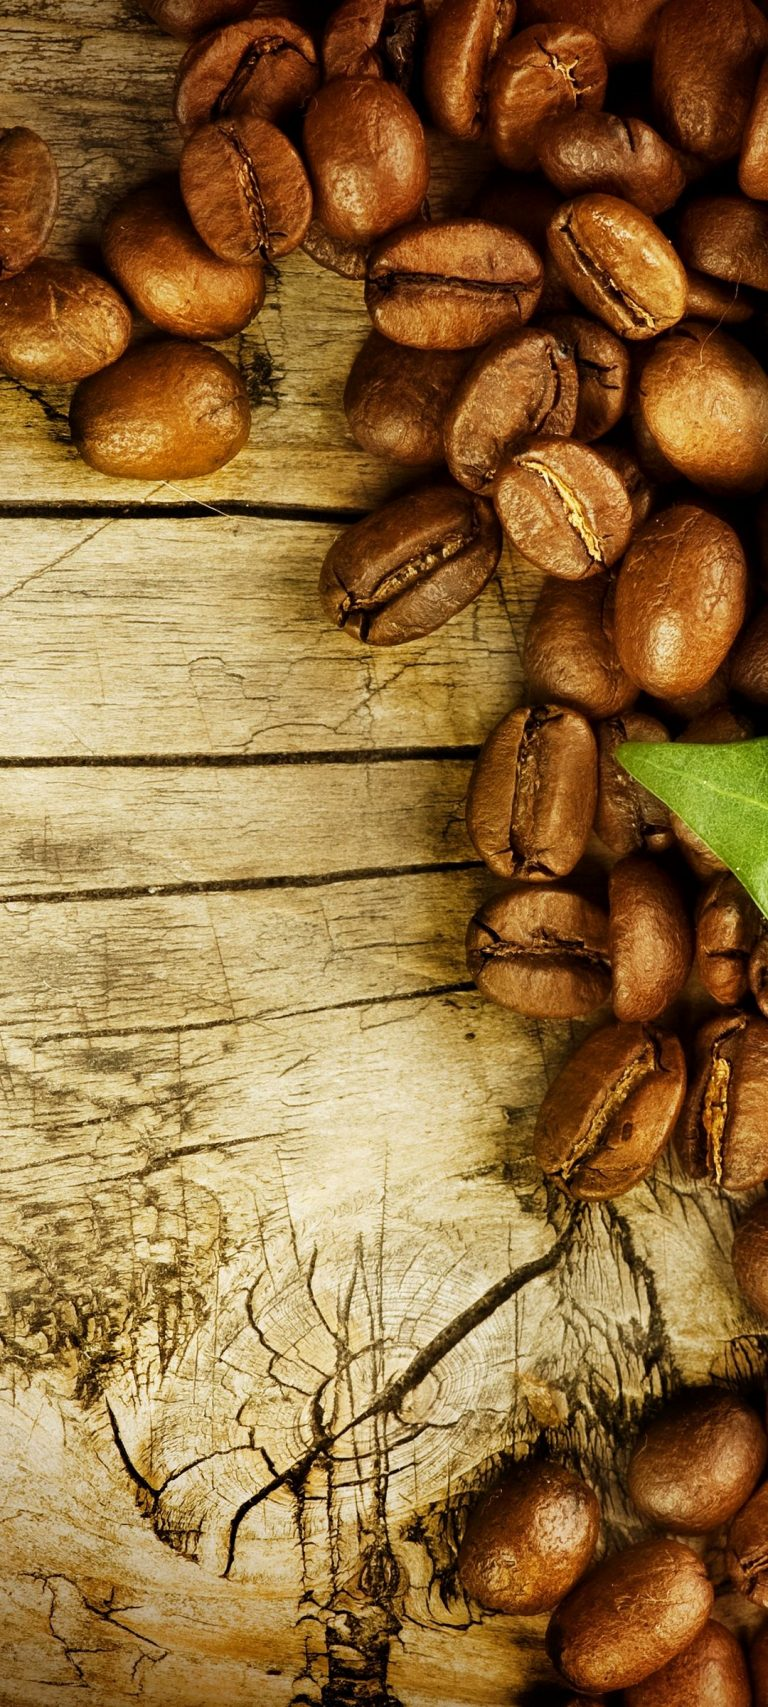 Coffee Grains Leaves Board 1080x2400 768x1707